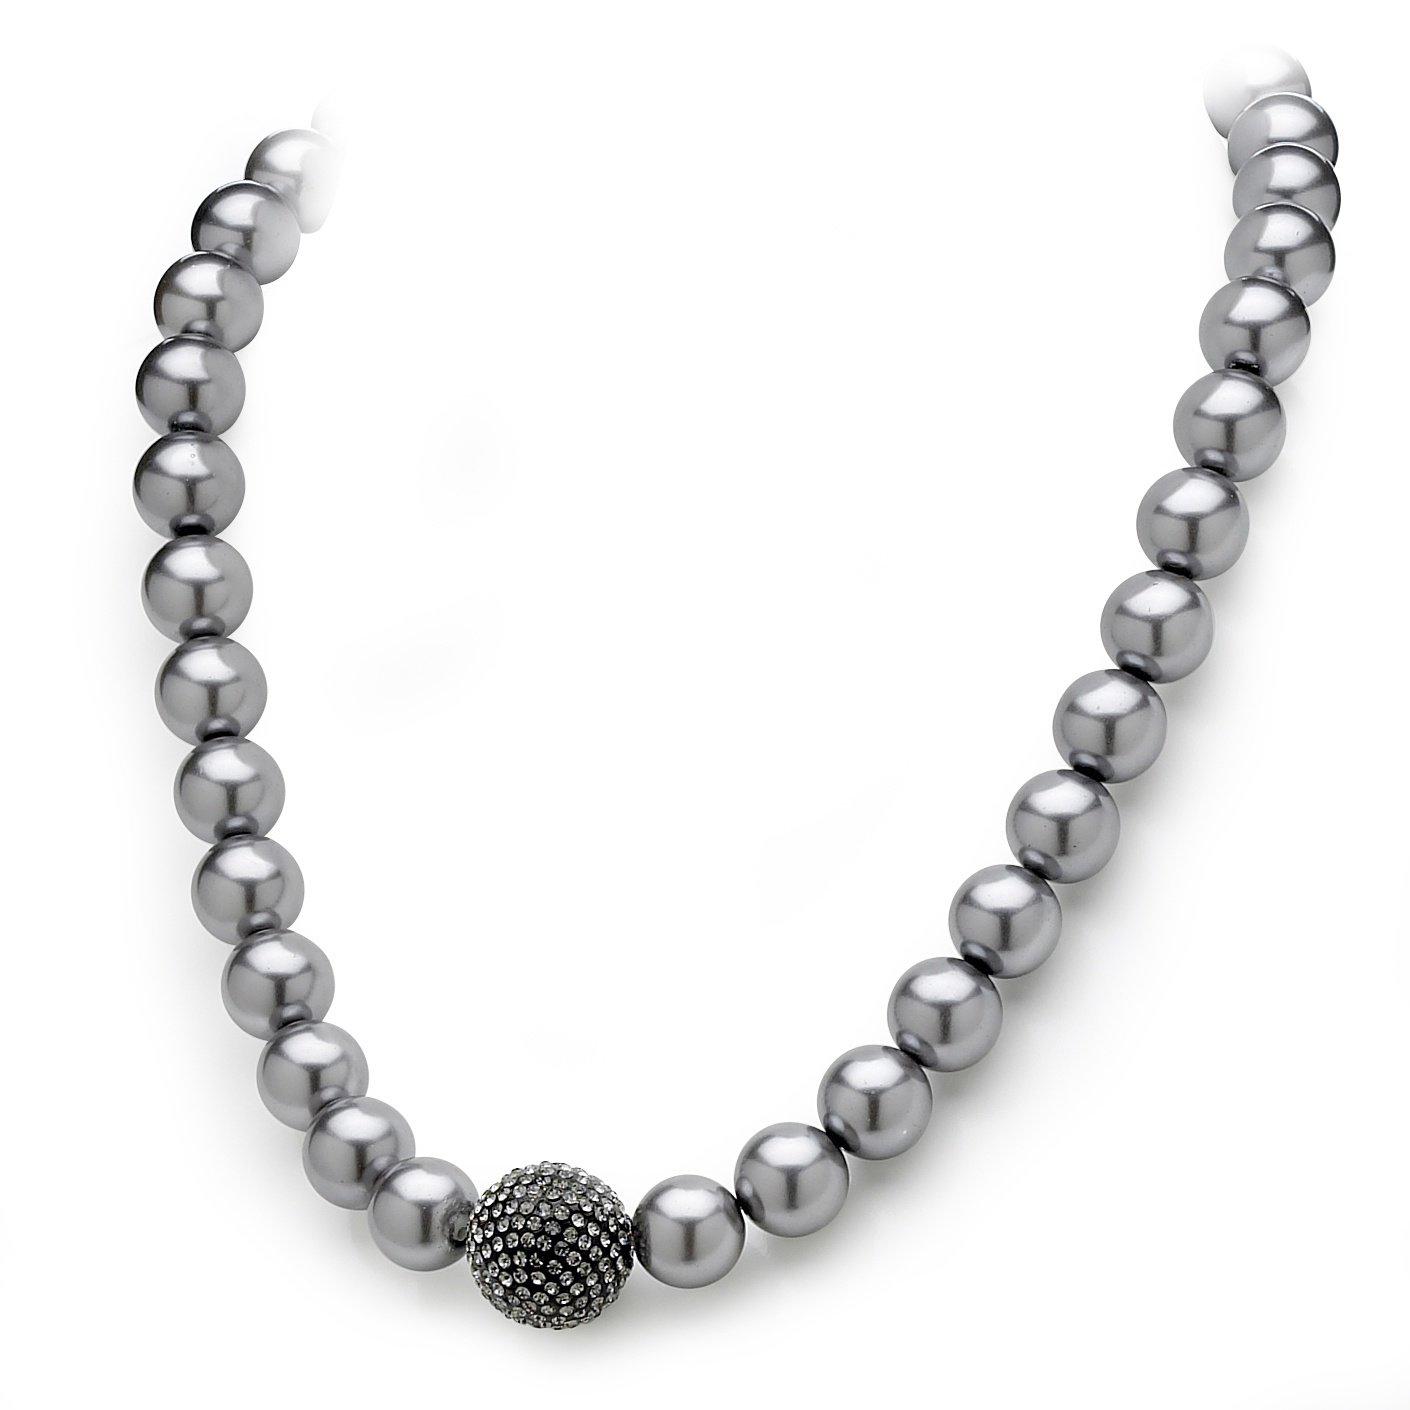 Pearls & Beads